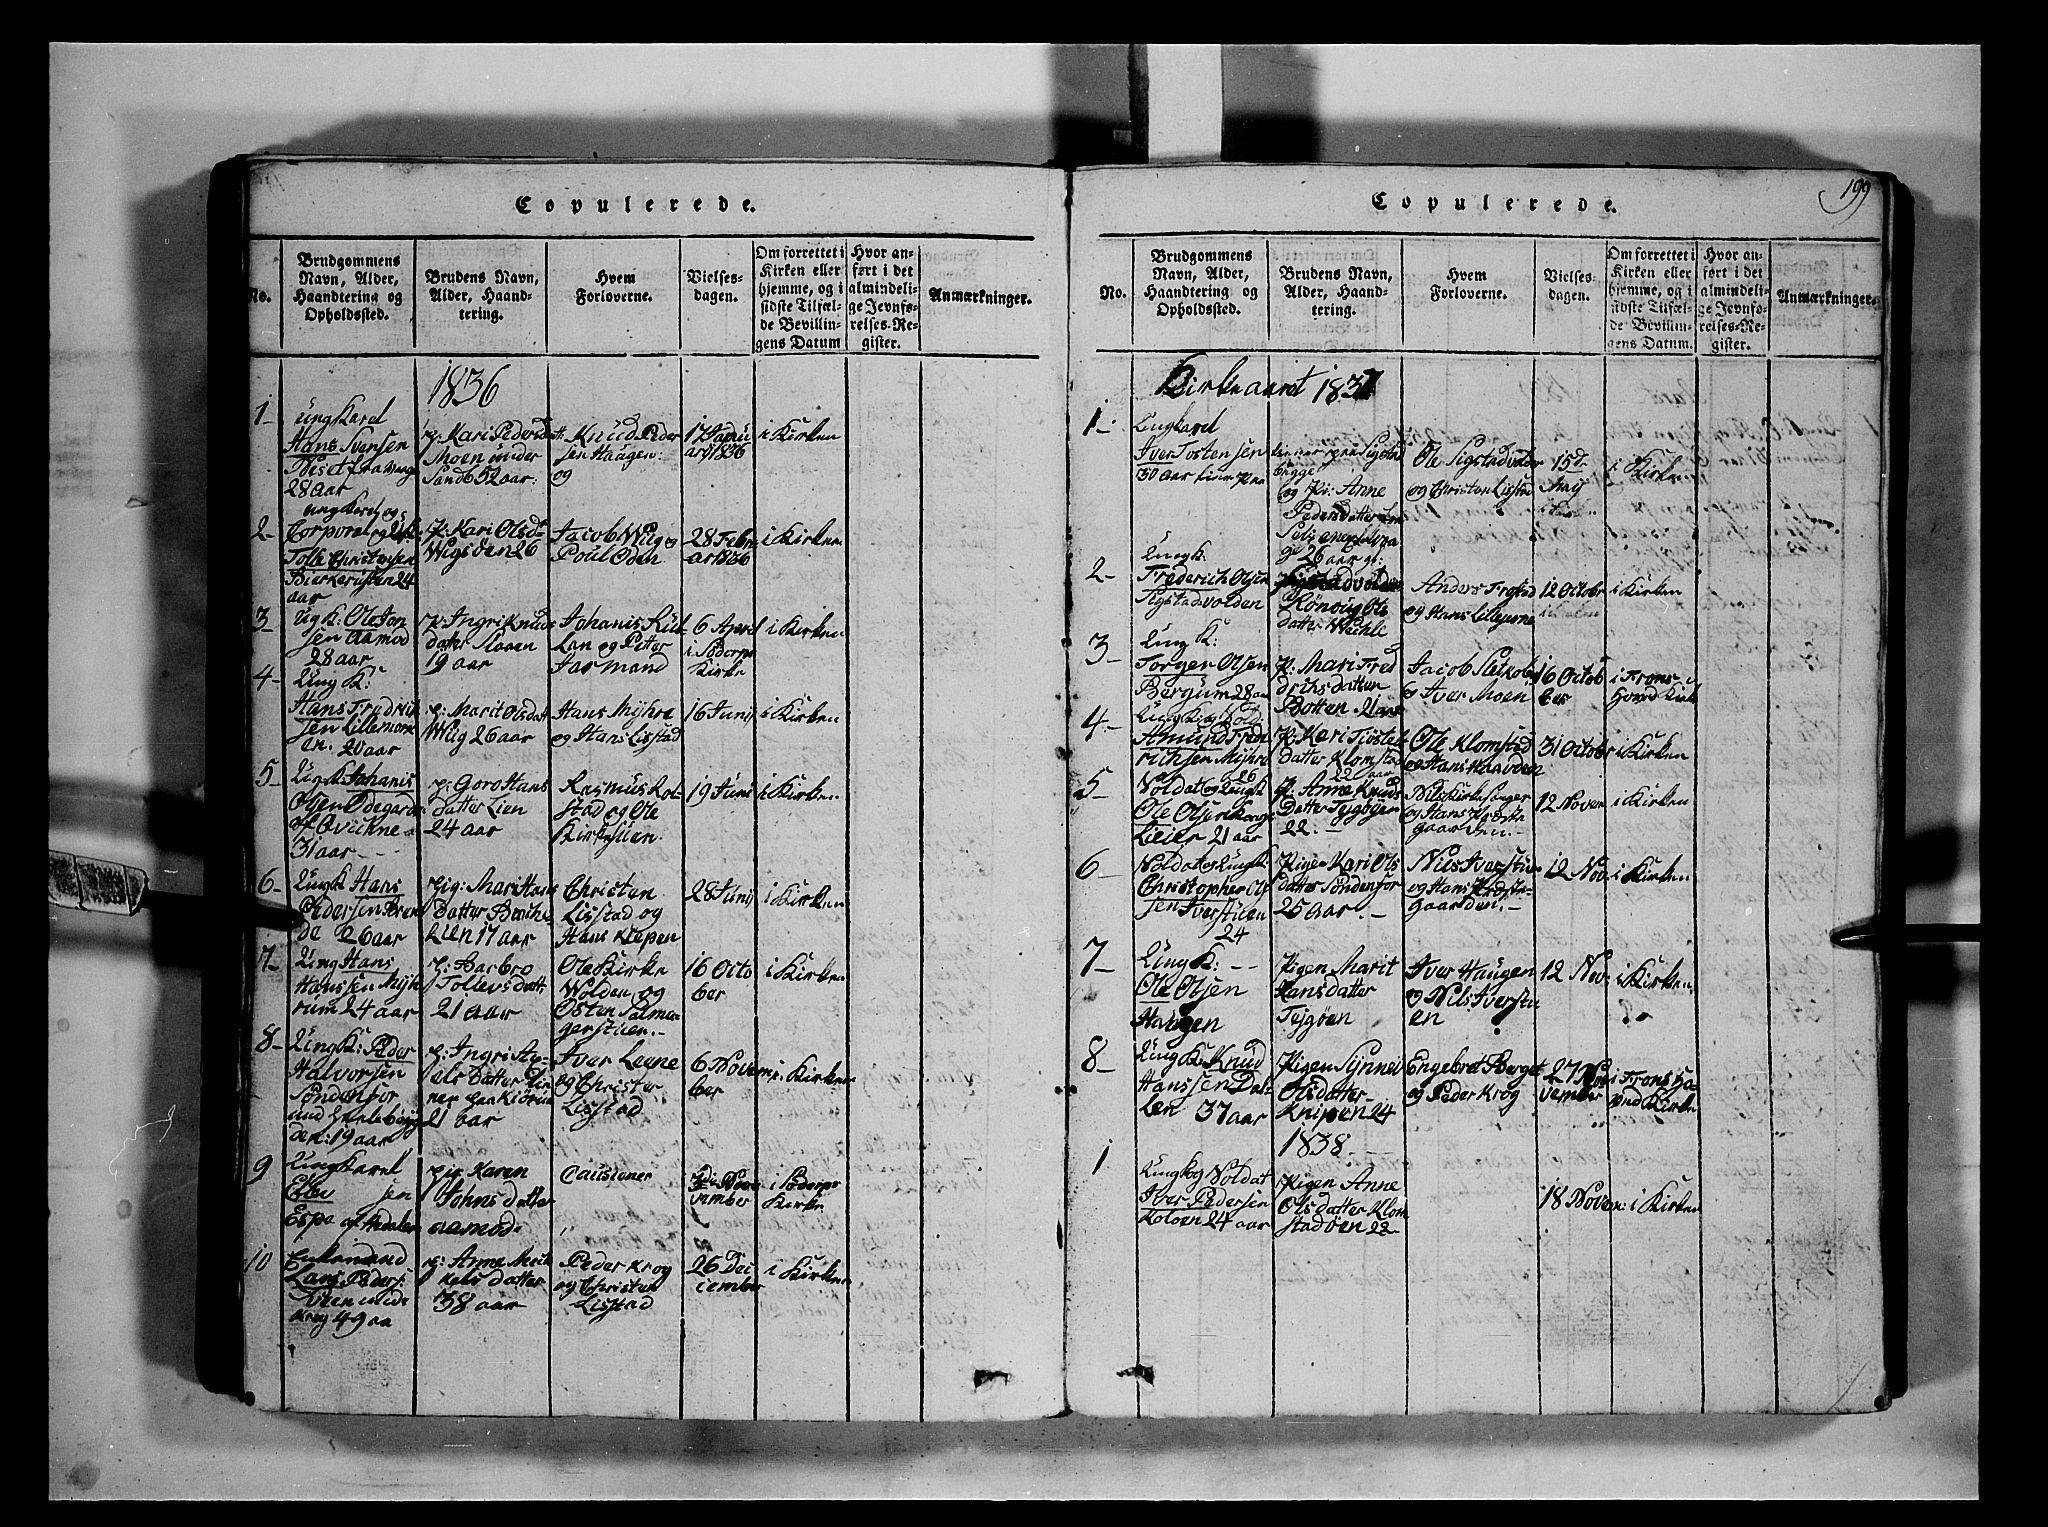 SAH, Fron prestekontor, H/Ha/Hab/L0002: Klokkerbok nr. 2, 1816-1850, s. 199